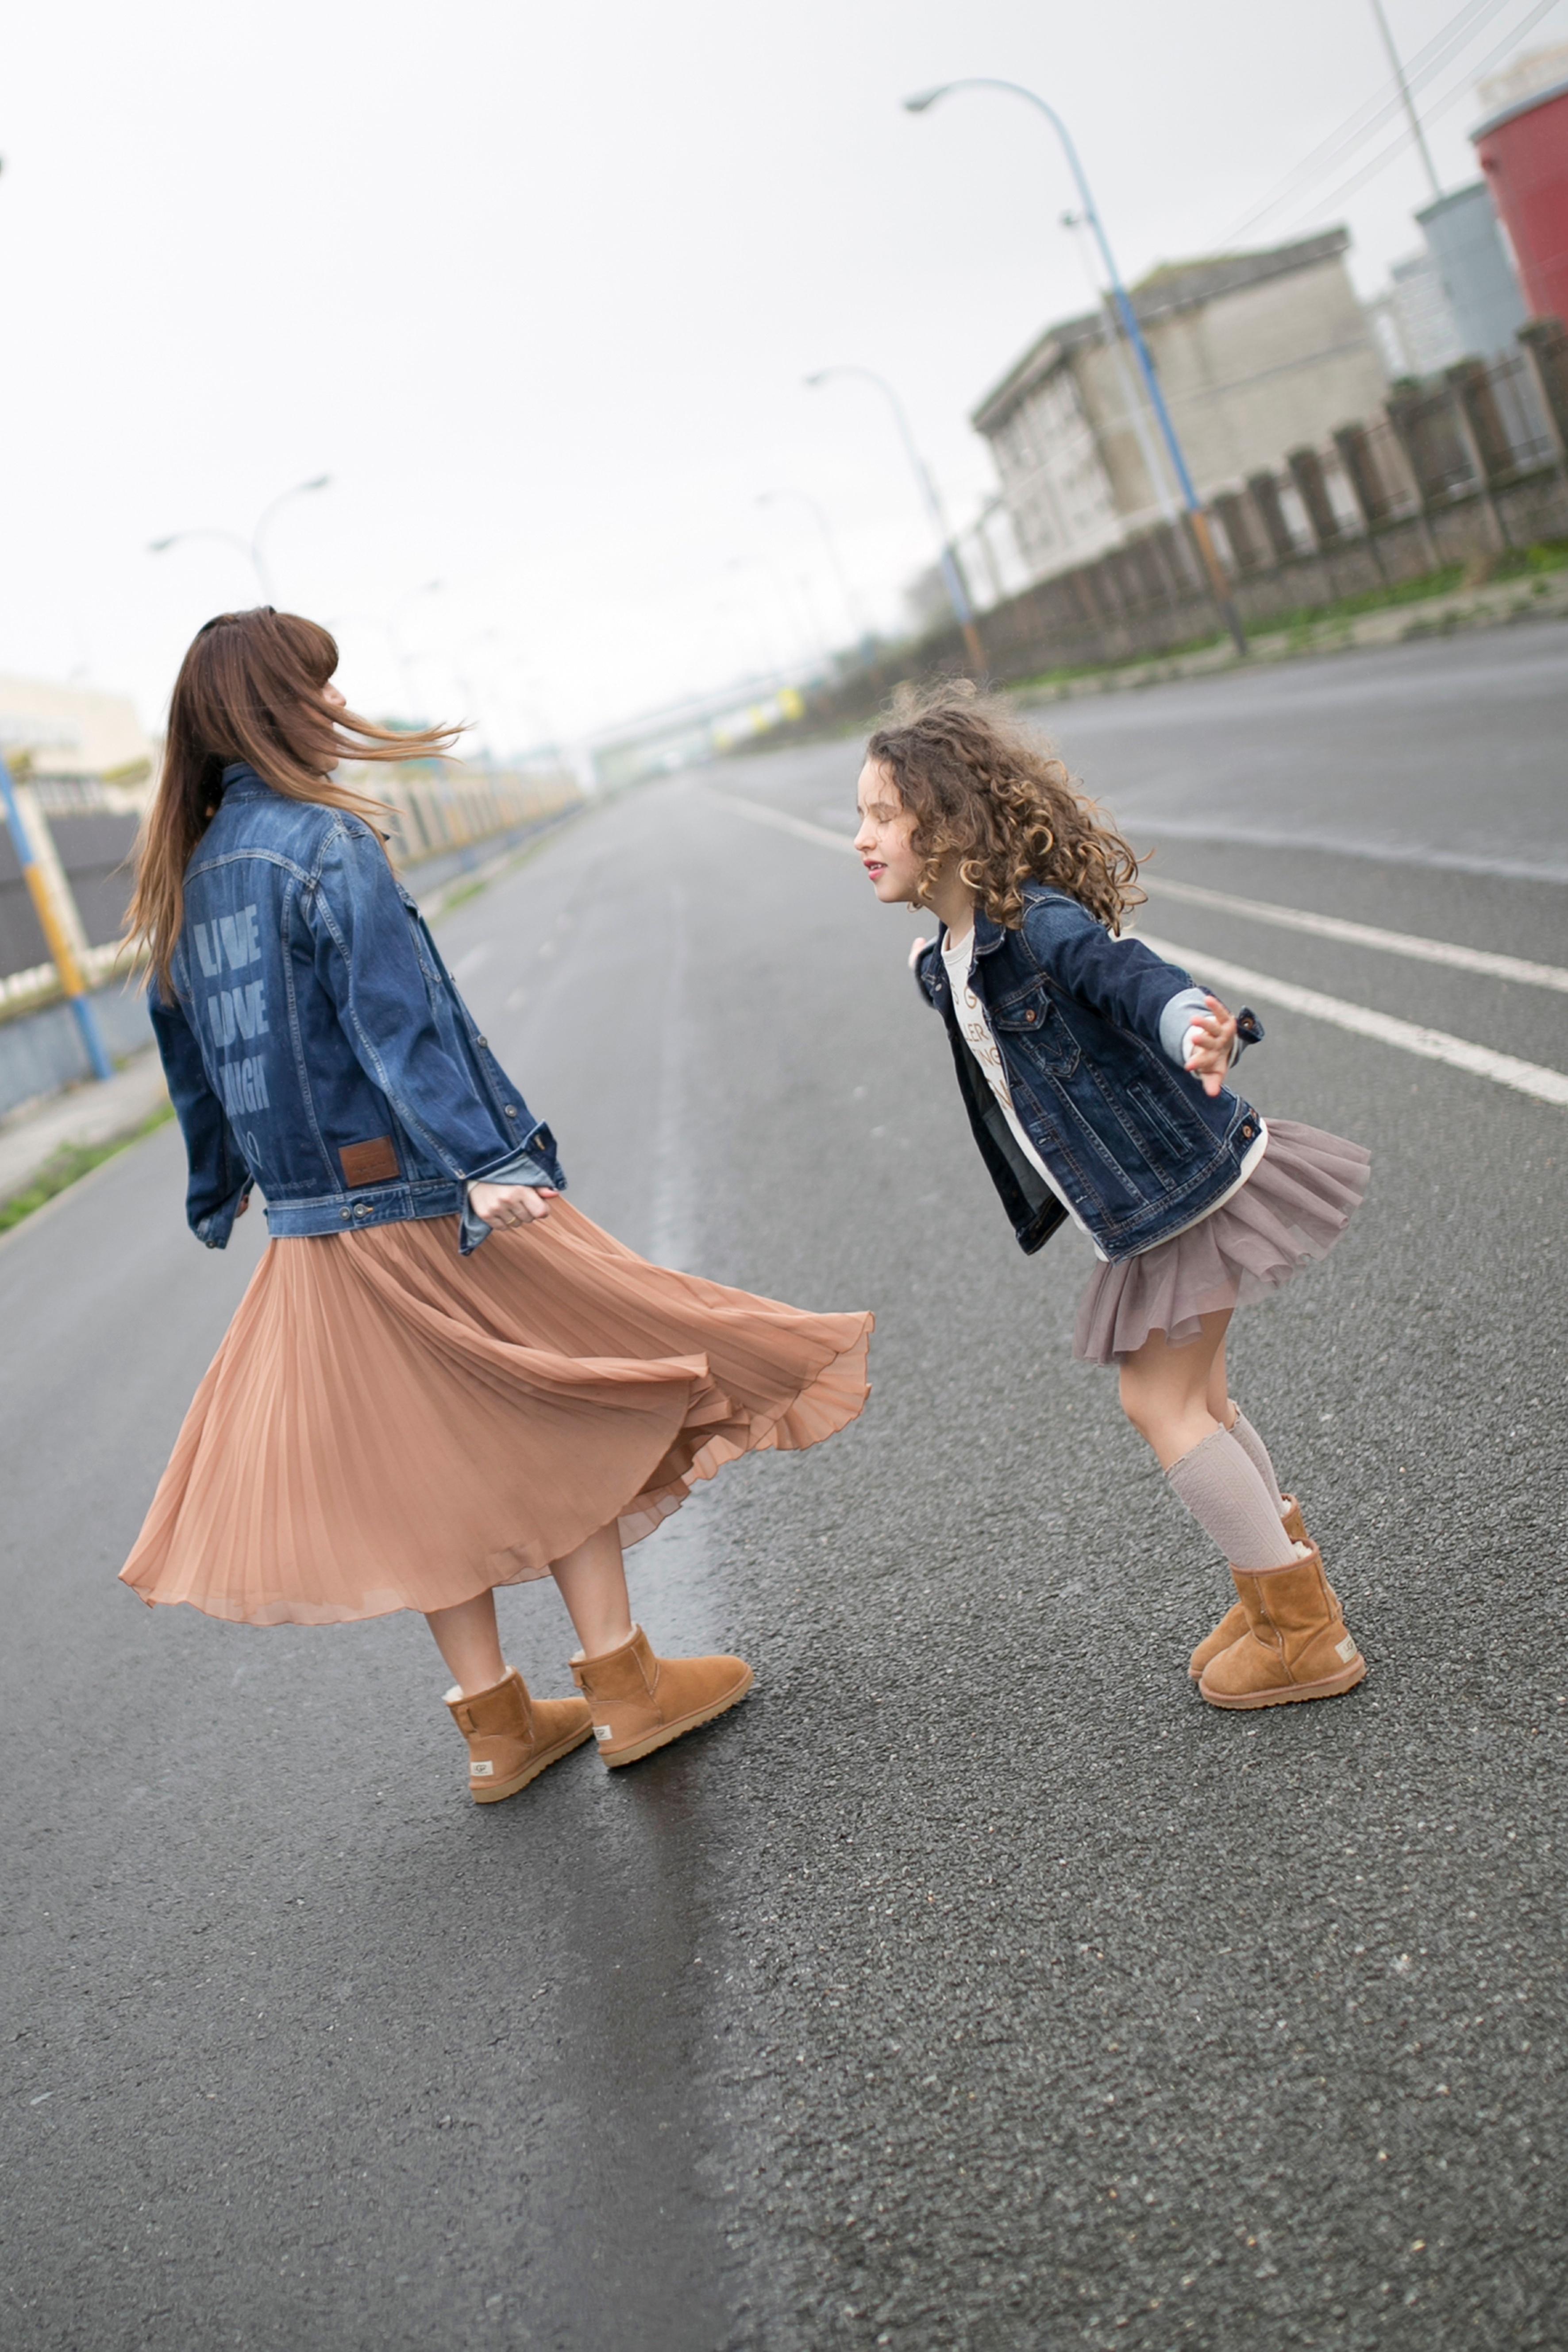 calle-estilo-mother and daughter- pepe jeans- Ugg- zara- zarakids-Ugg look-denim-madre e hija-fashion